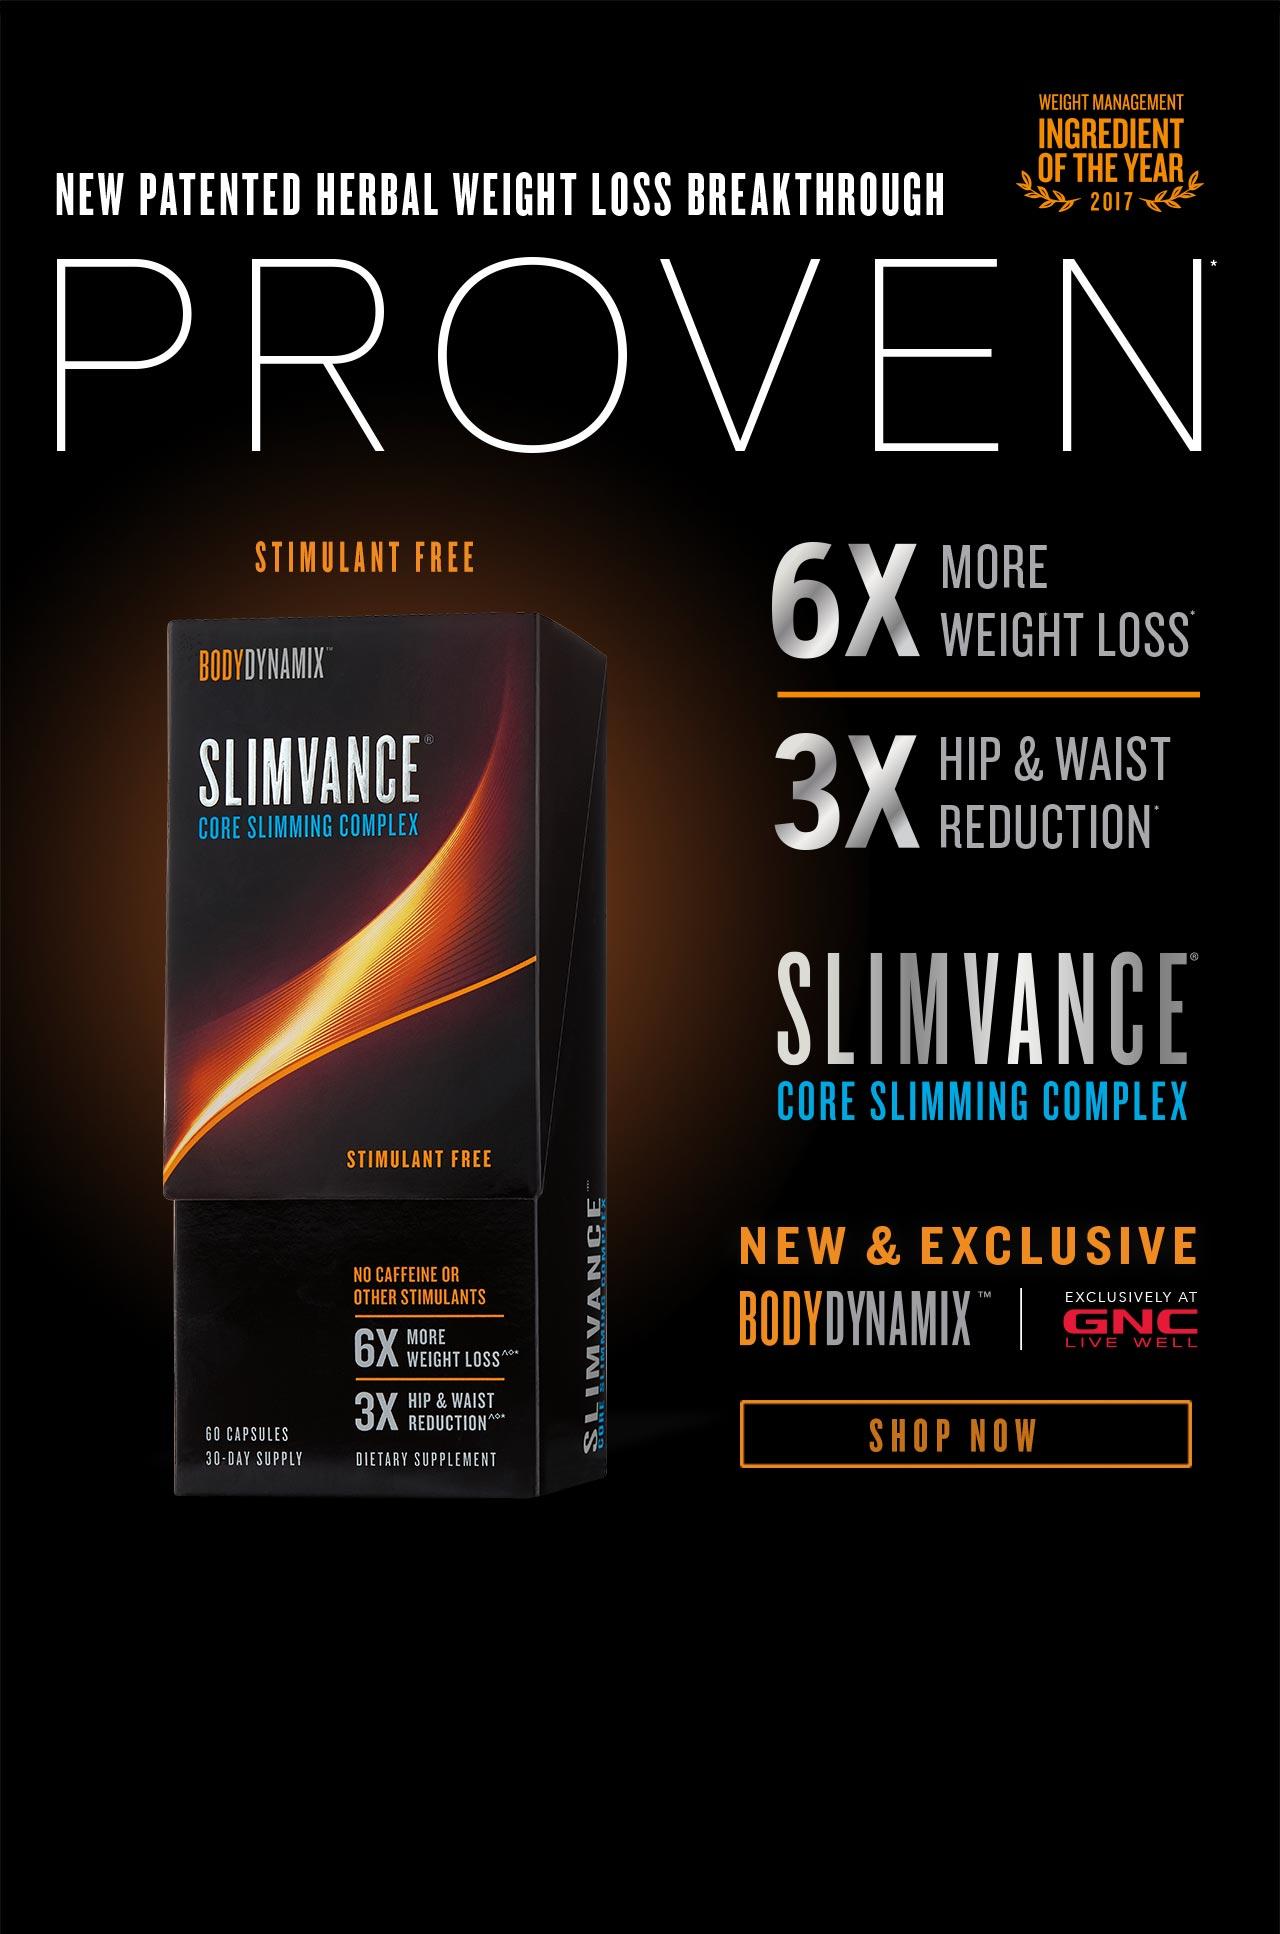 Slimvance Core Slimming Complex